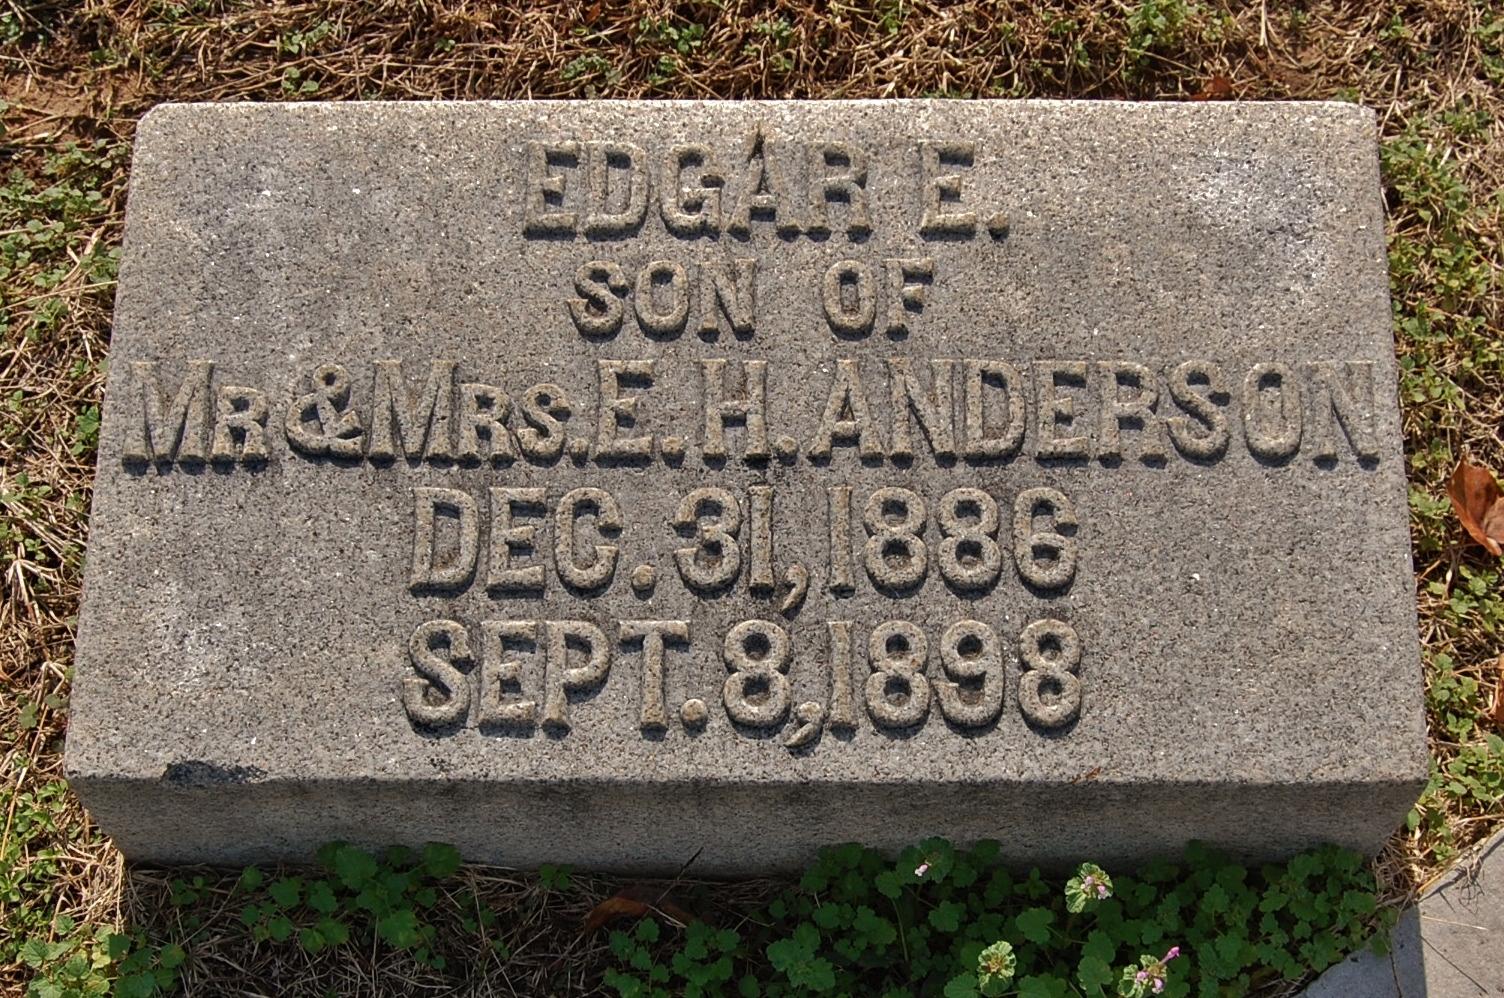 Edgar E. Anderson